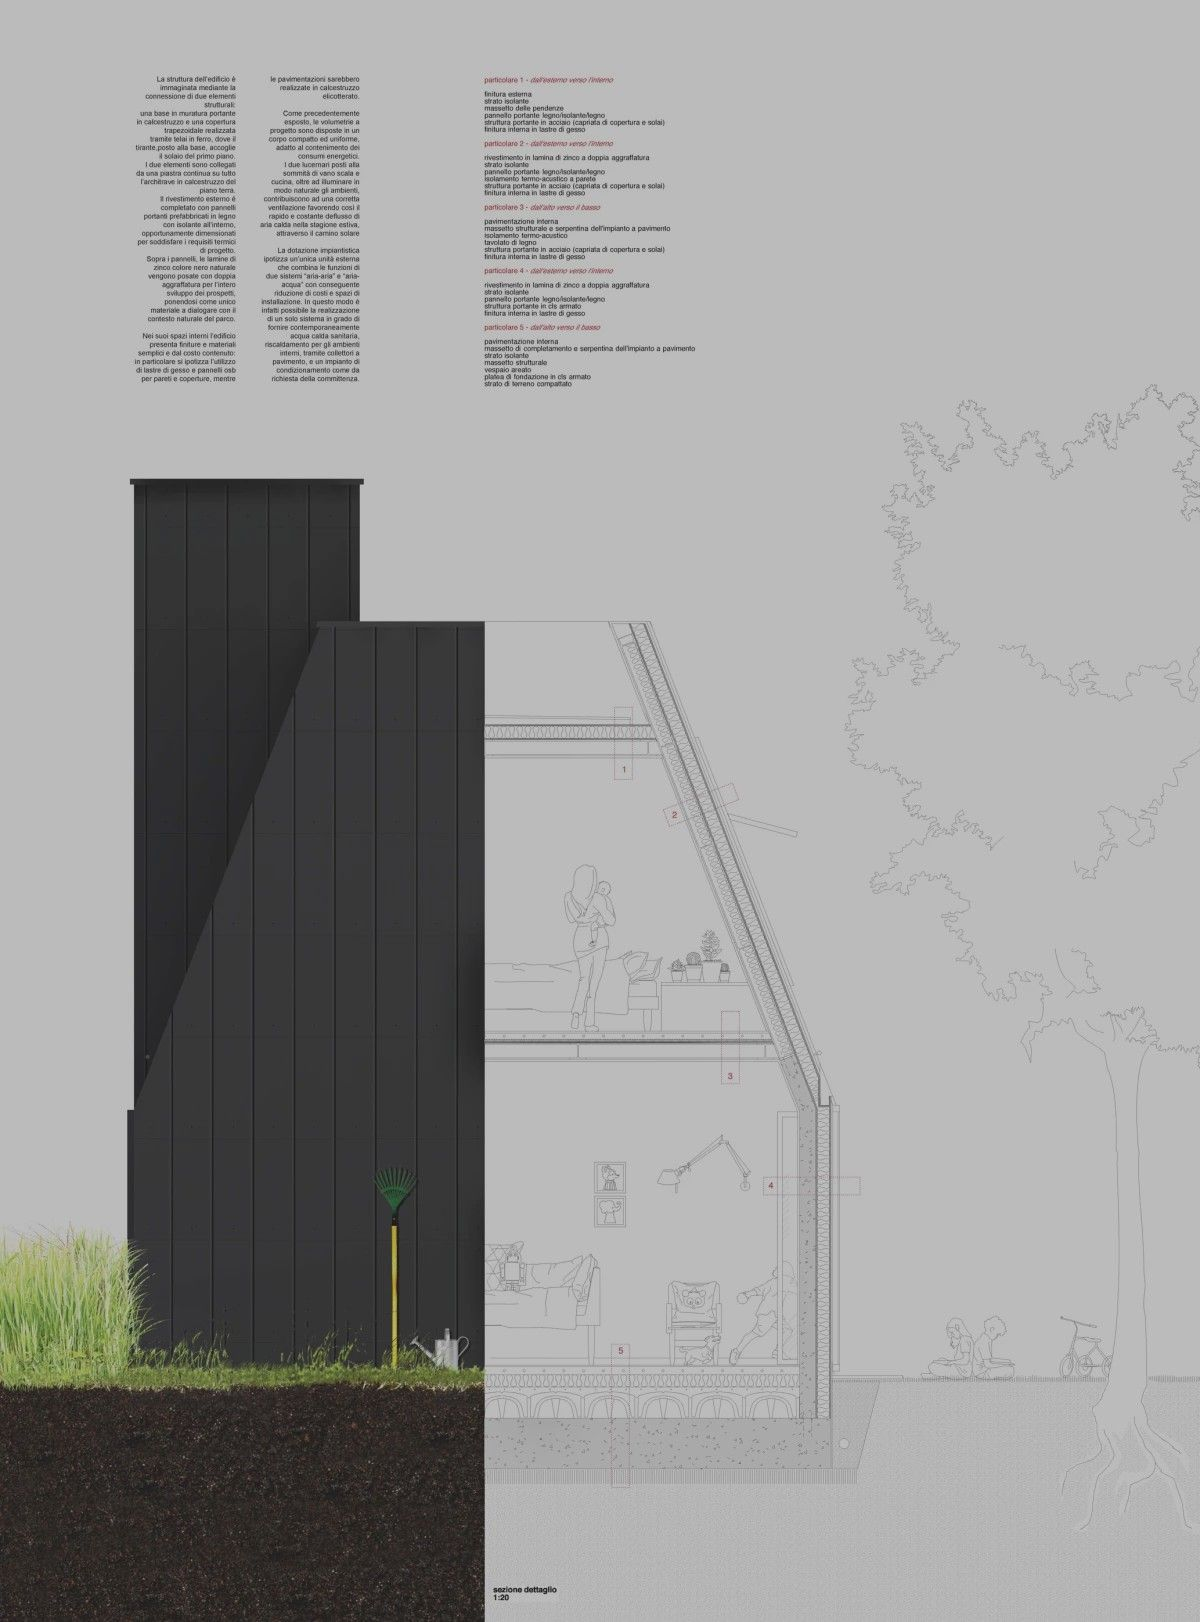 Struttura Di Un Solaio pin by juven zhu on archi-presentation | bar chart